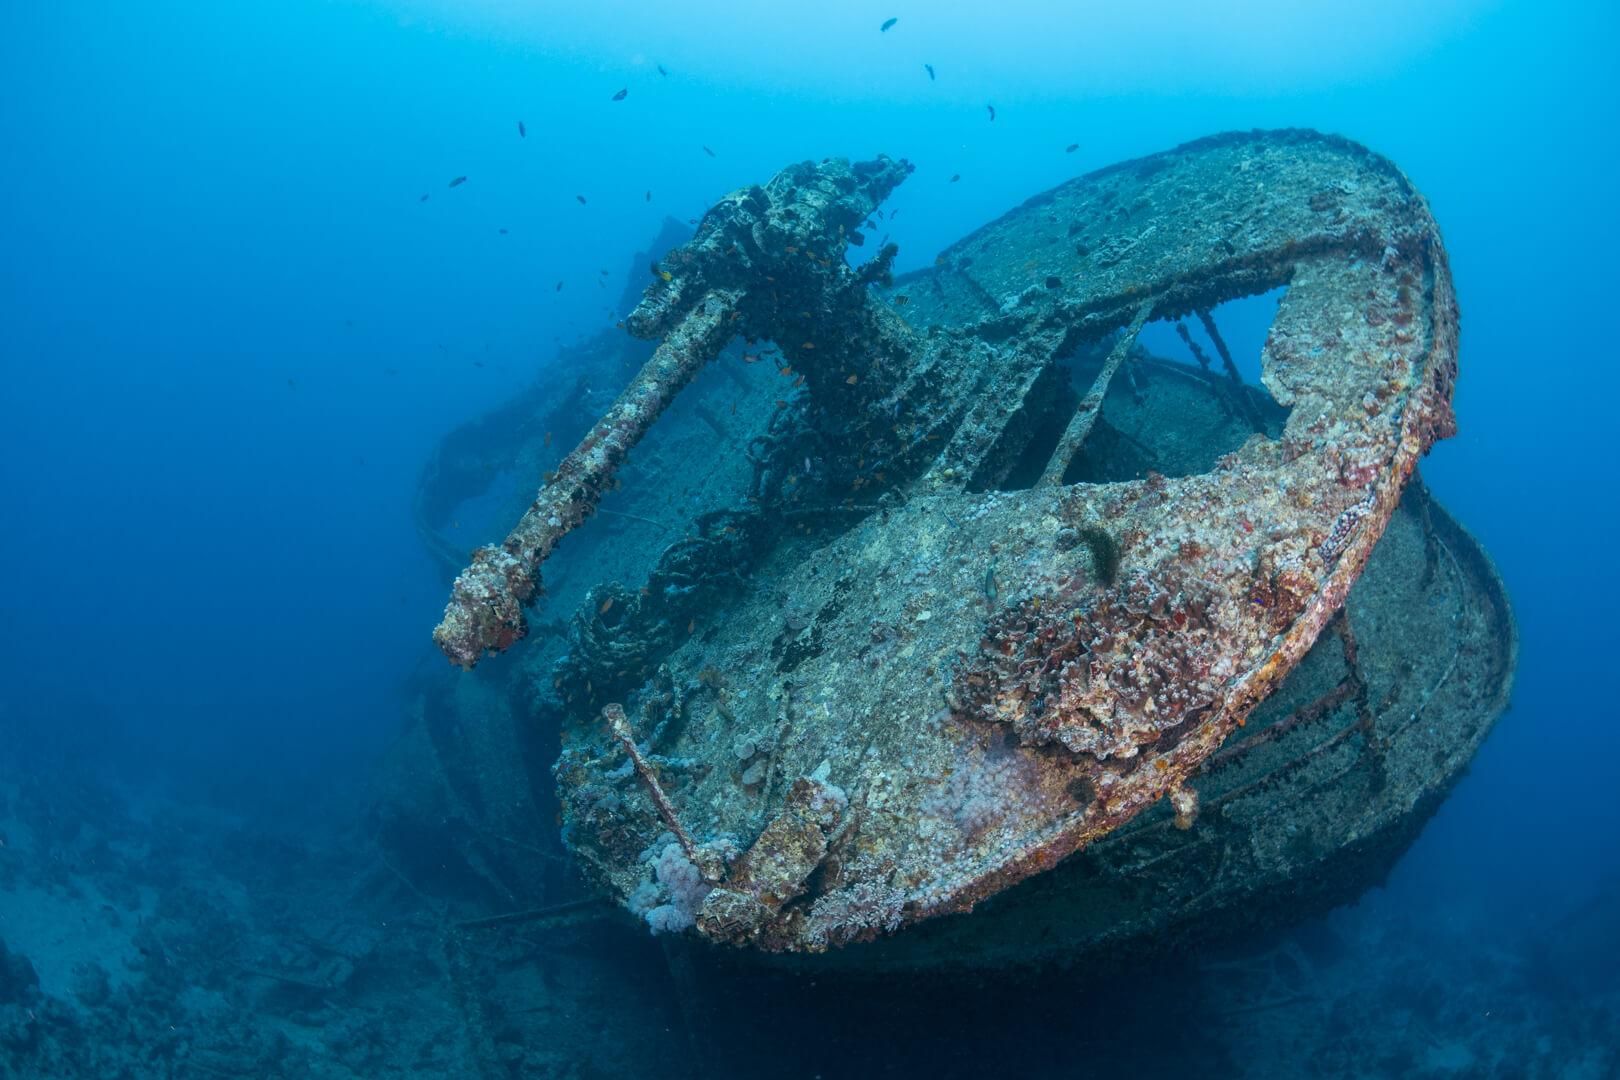 Scuba Travel, Thistlegorm, Red Sea, Wrecks and Reefs